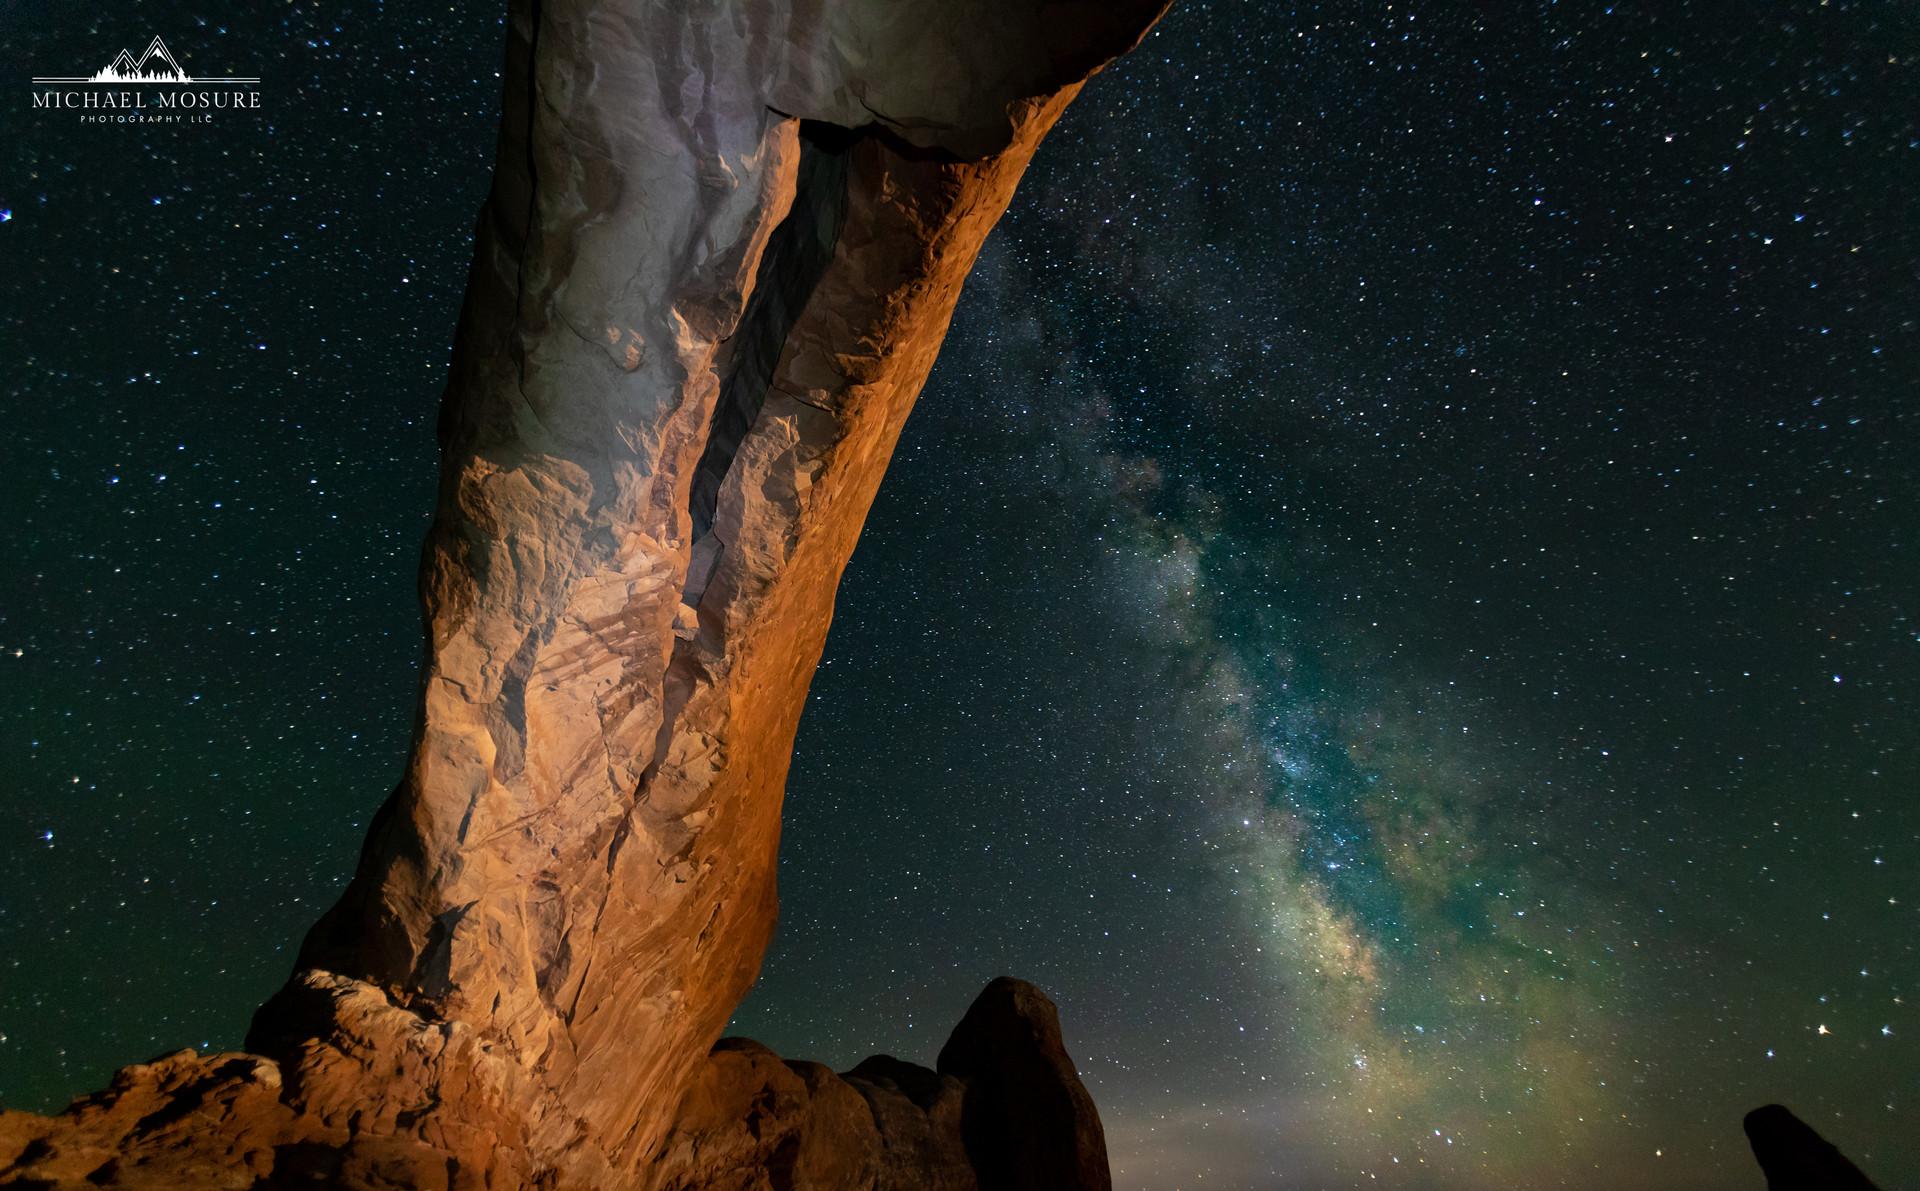 Arches, NP Milky Way Glow